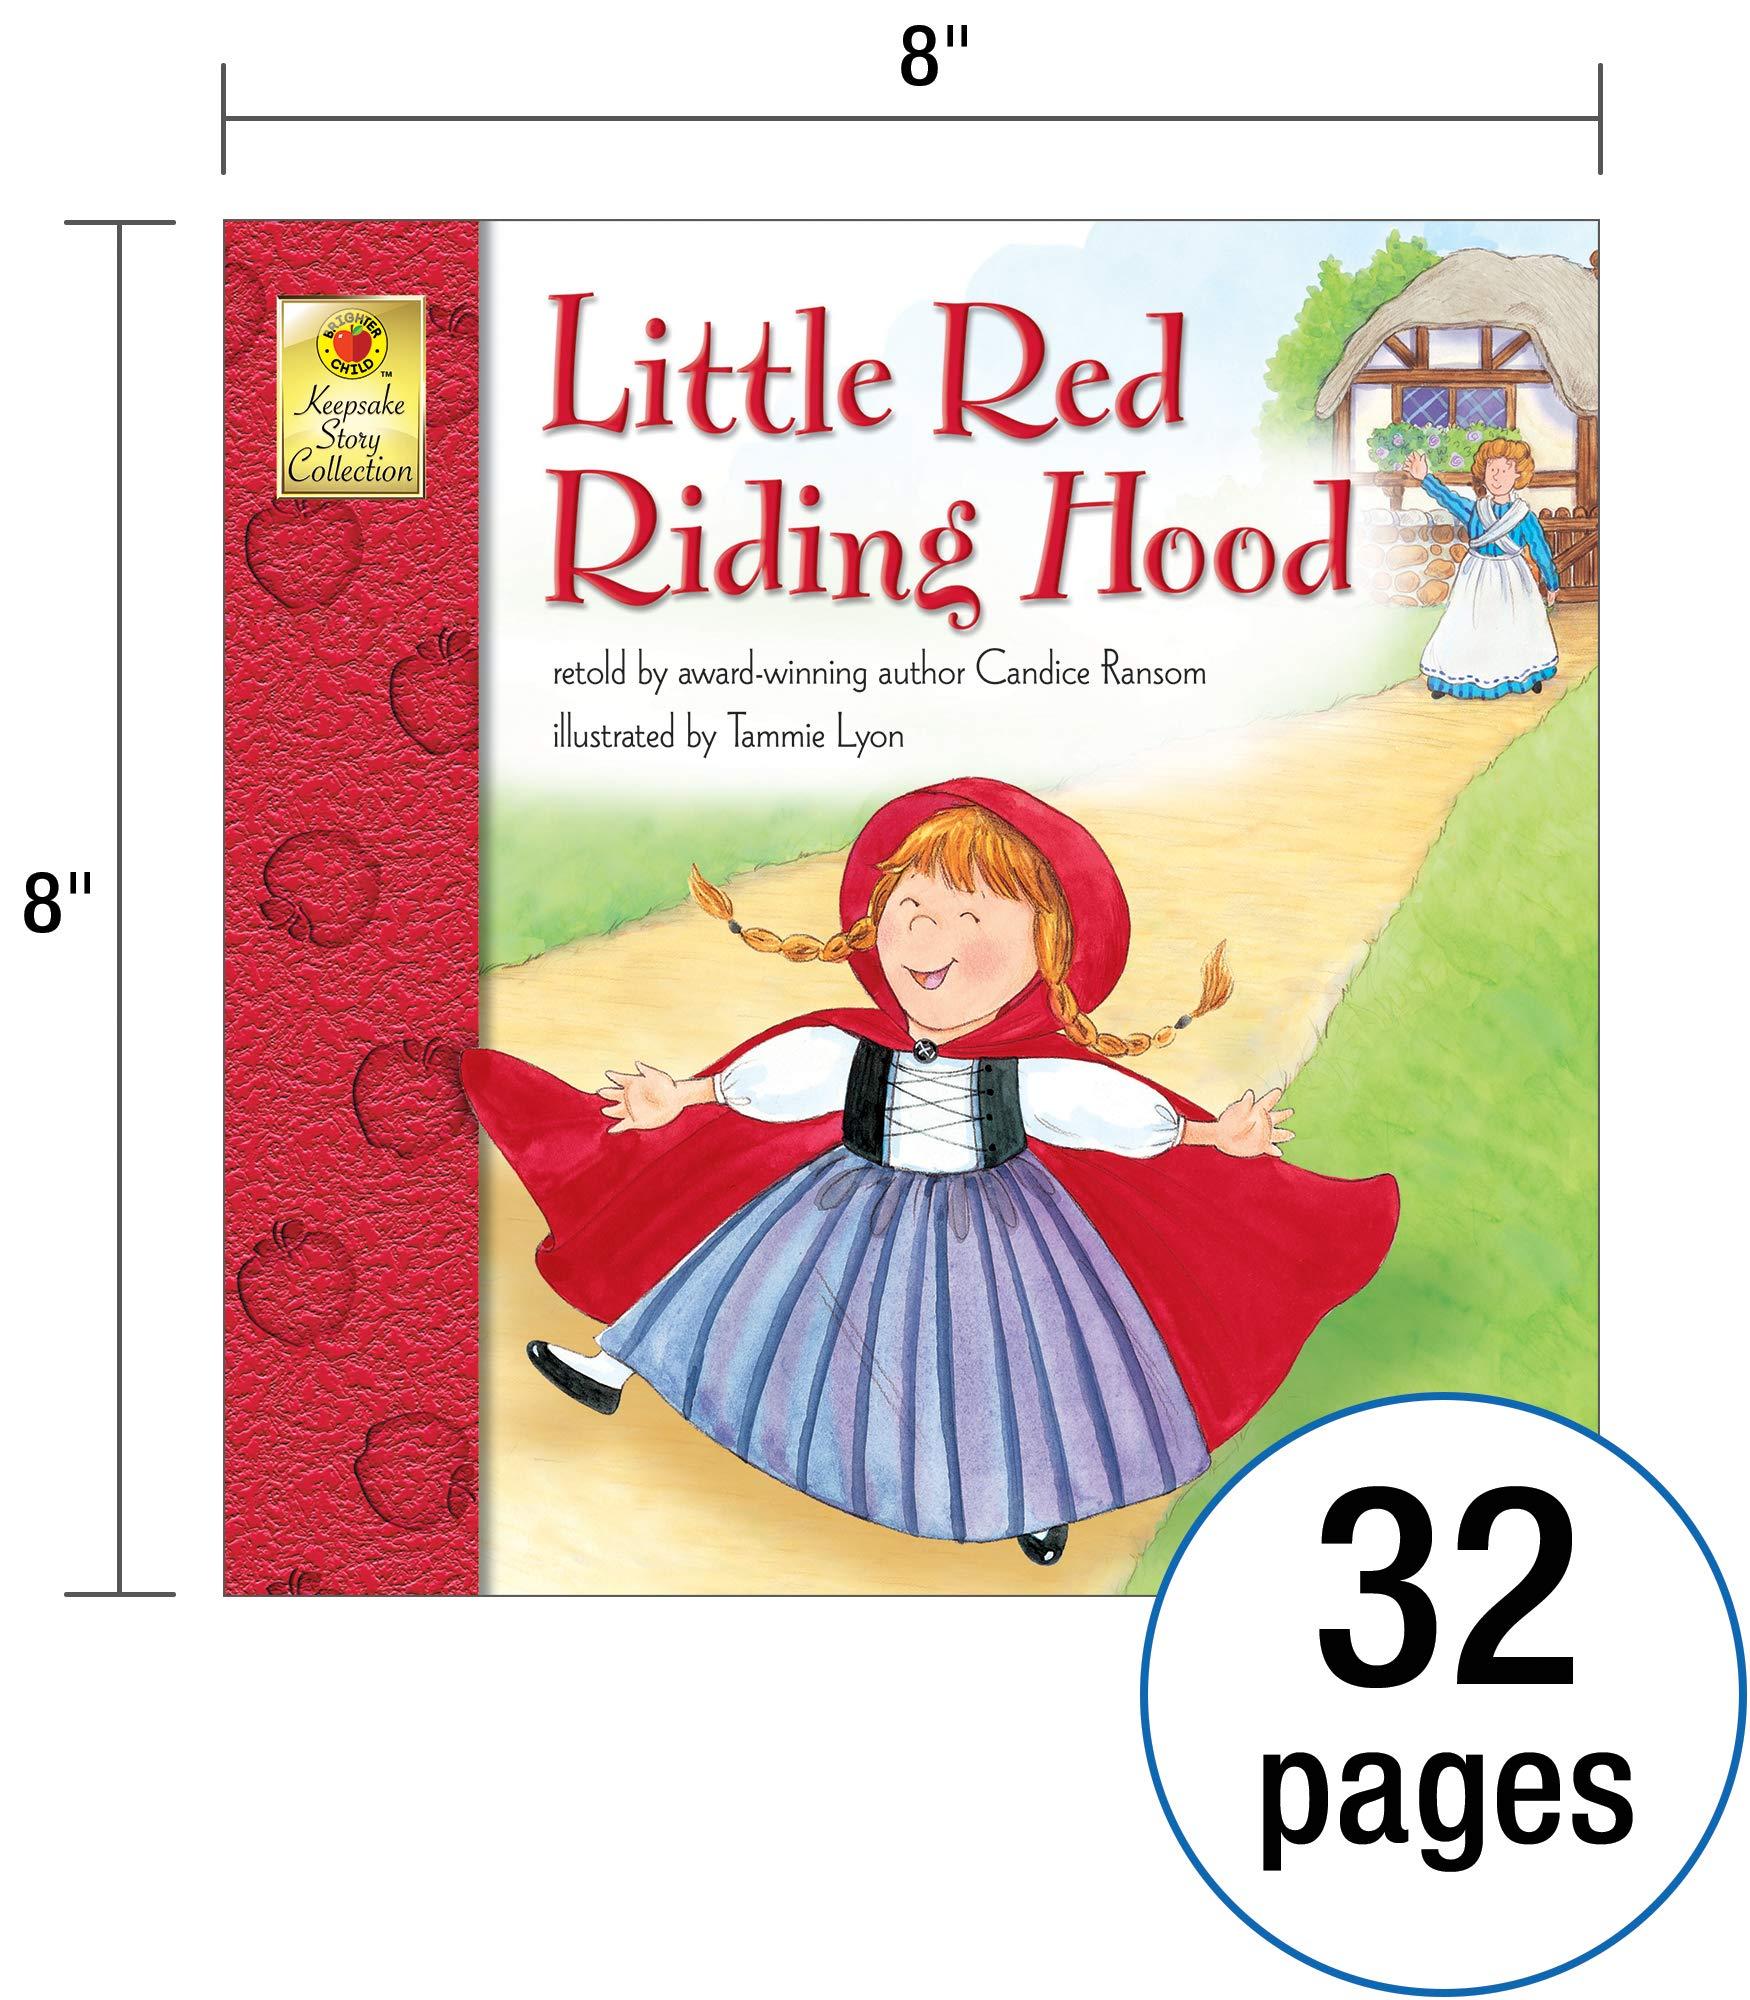 Amazon.com: Little Red Riding Hood (Keepsake Stories) (9781577681984):  Candice Ransom, Tammie Lyon: Books